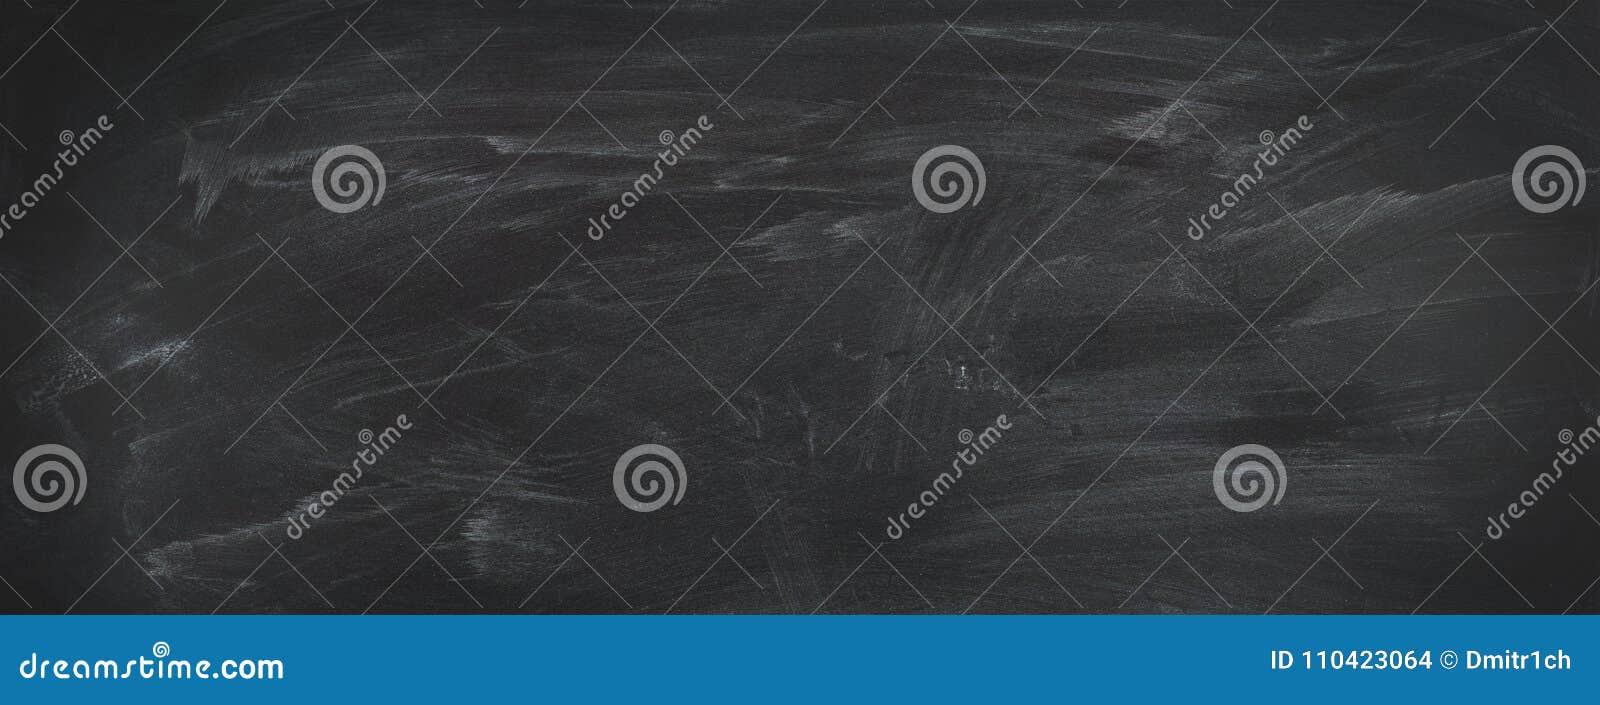 blackboard background chalkboard texture for adding chalk text